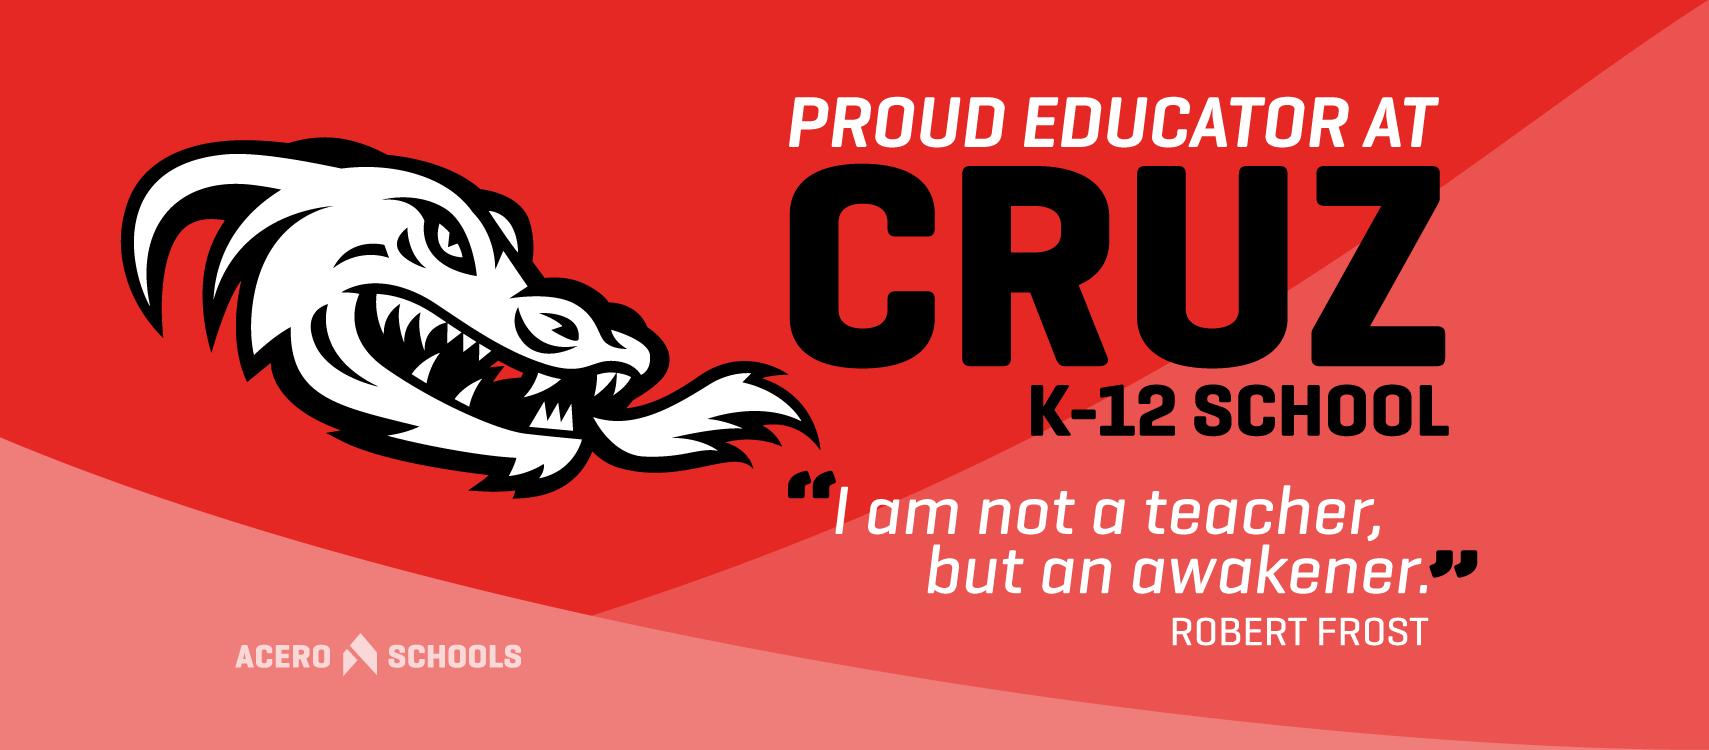 Cruz_Teacher_Cover